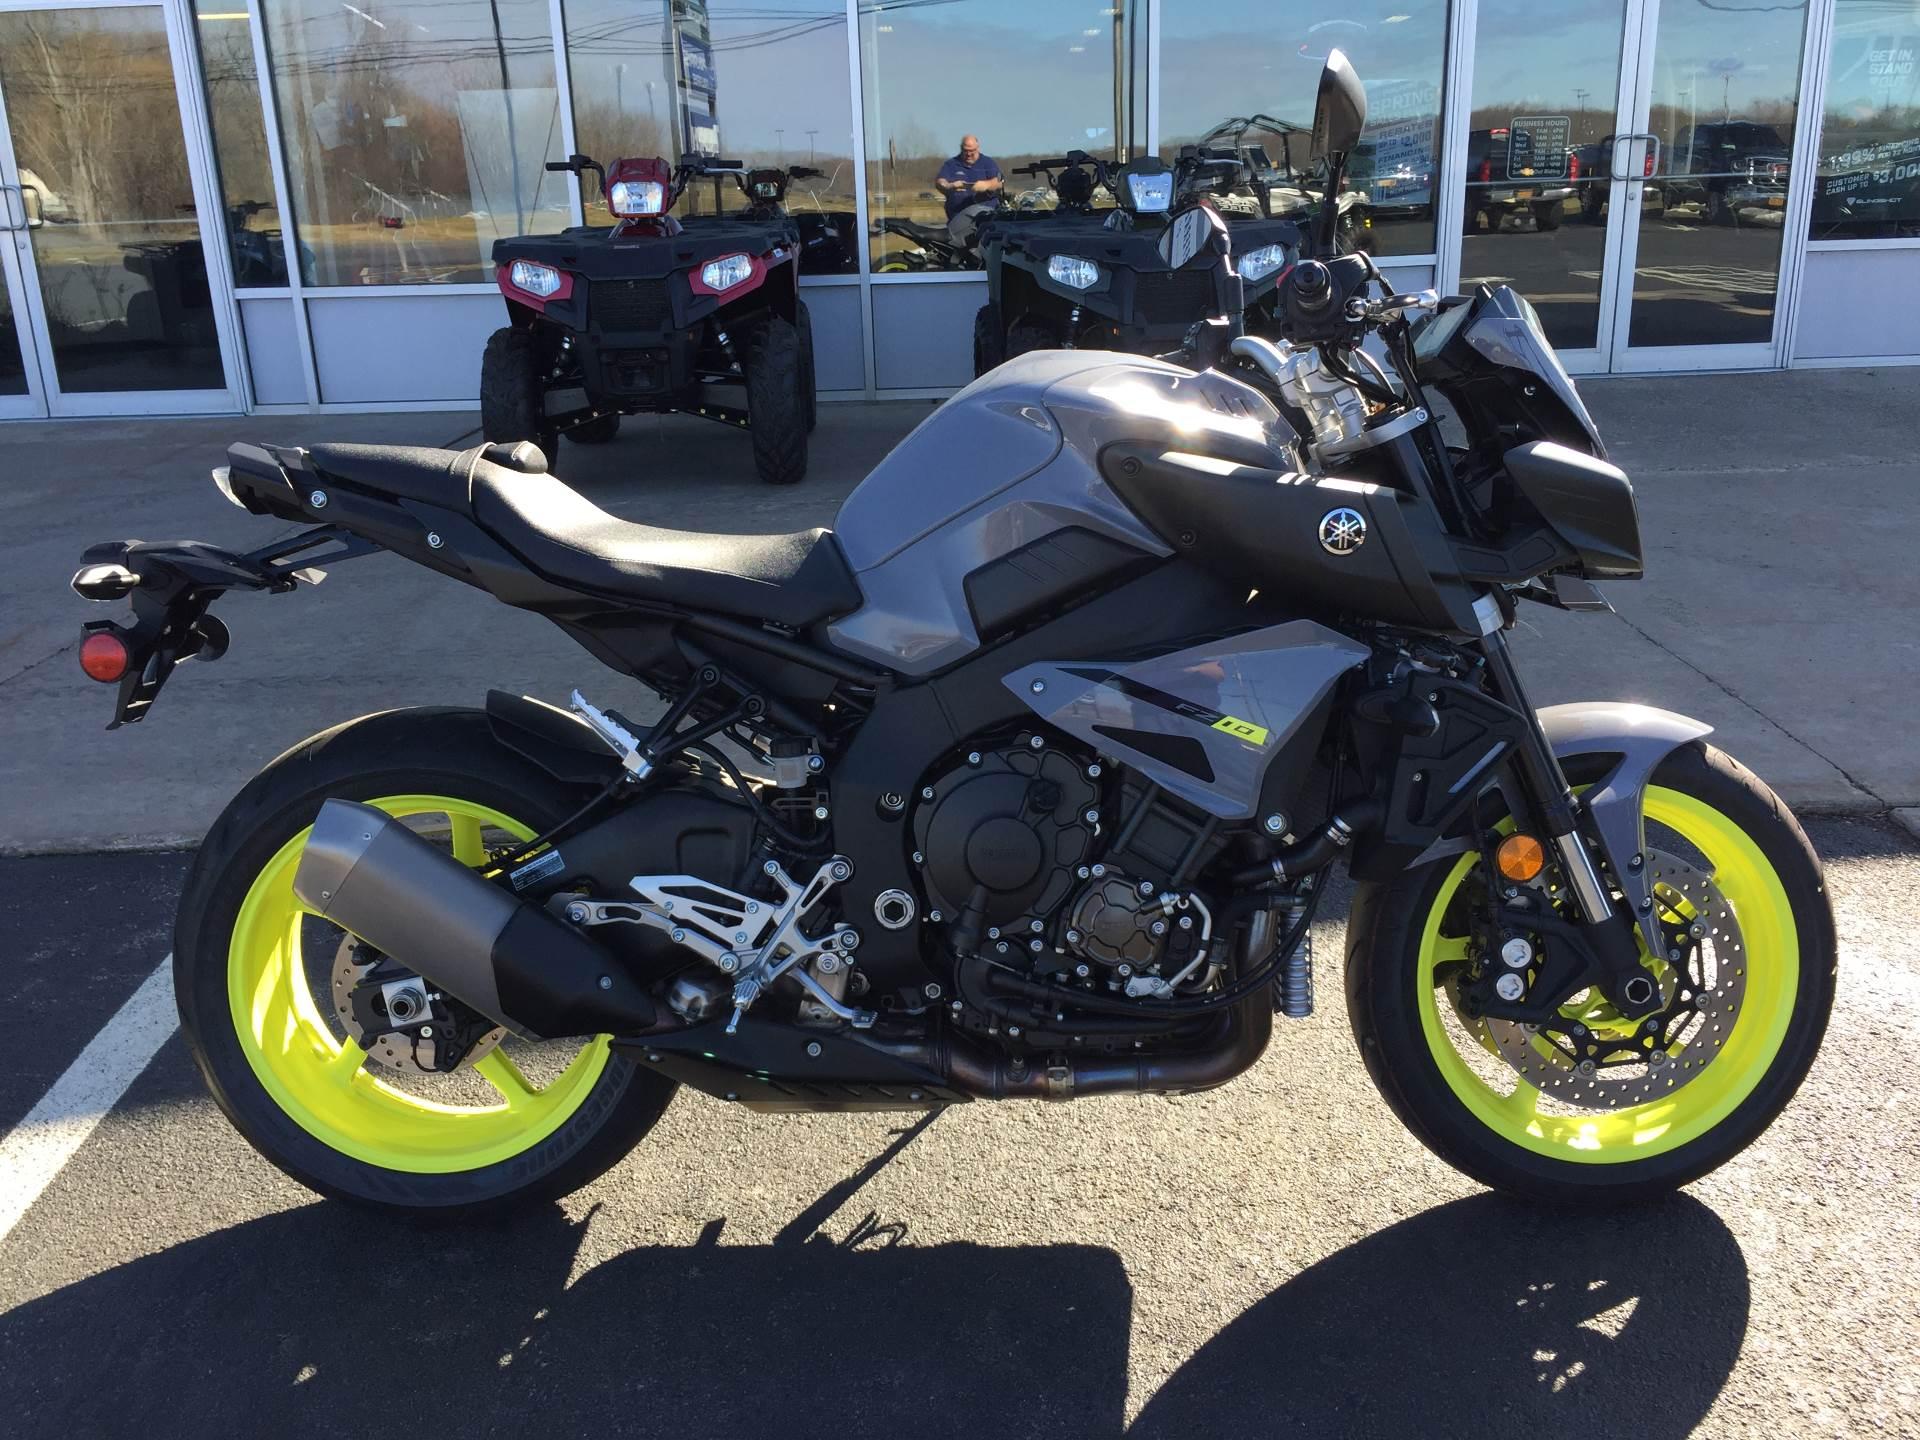 2017 Yamaha FZ-10 for sale 1221